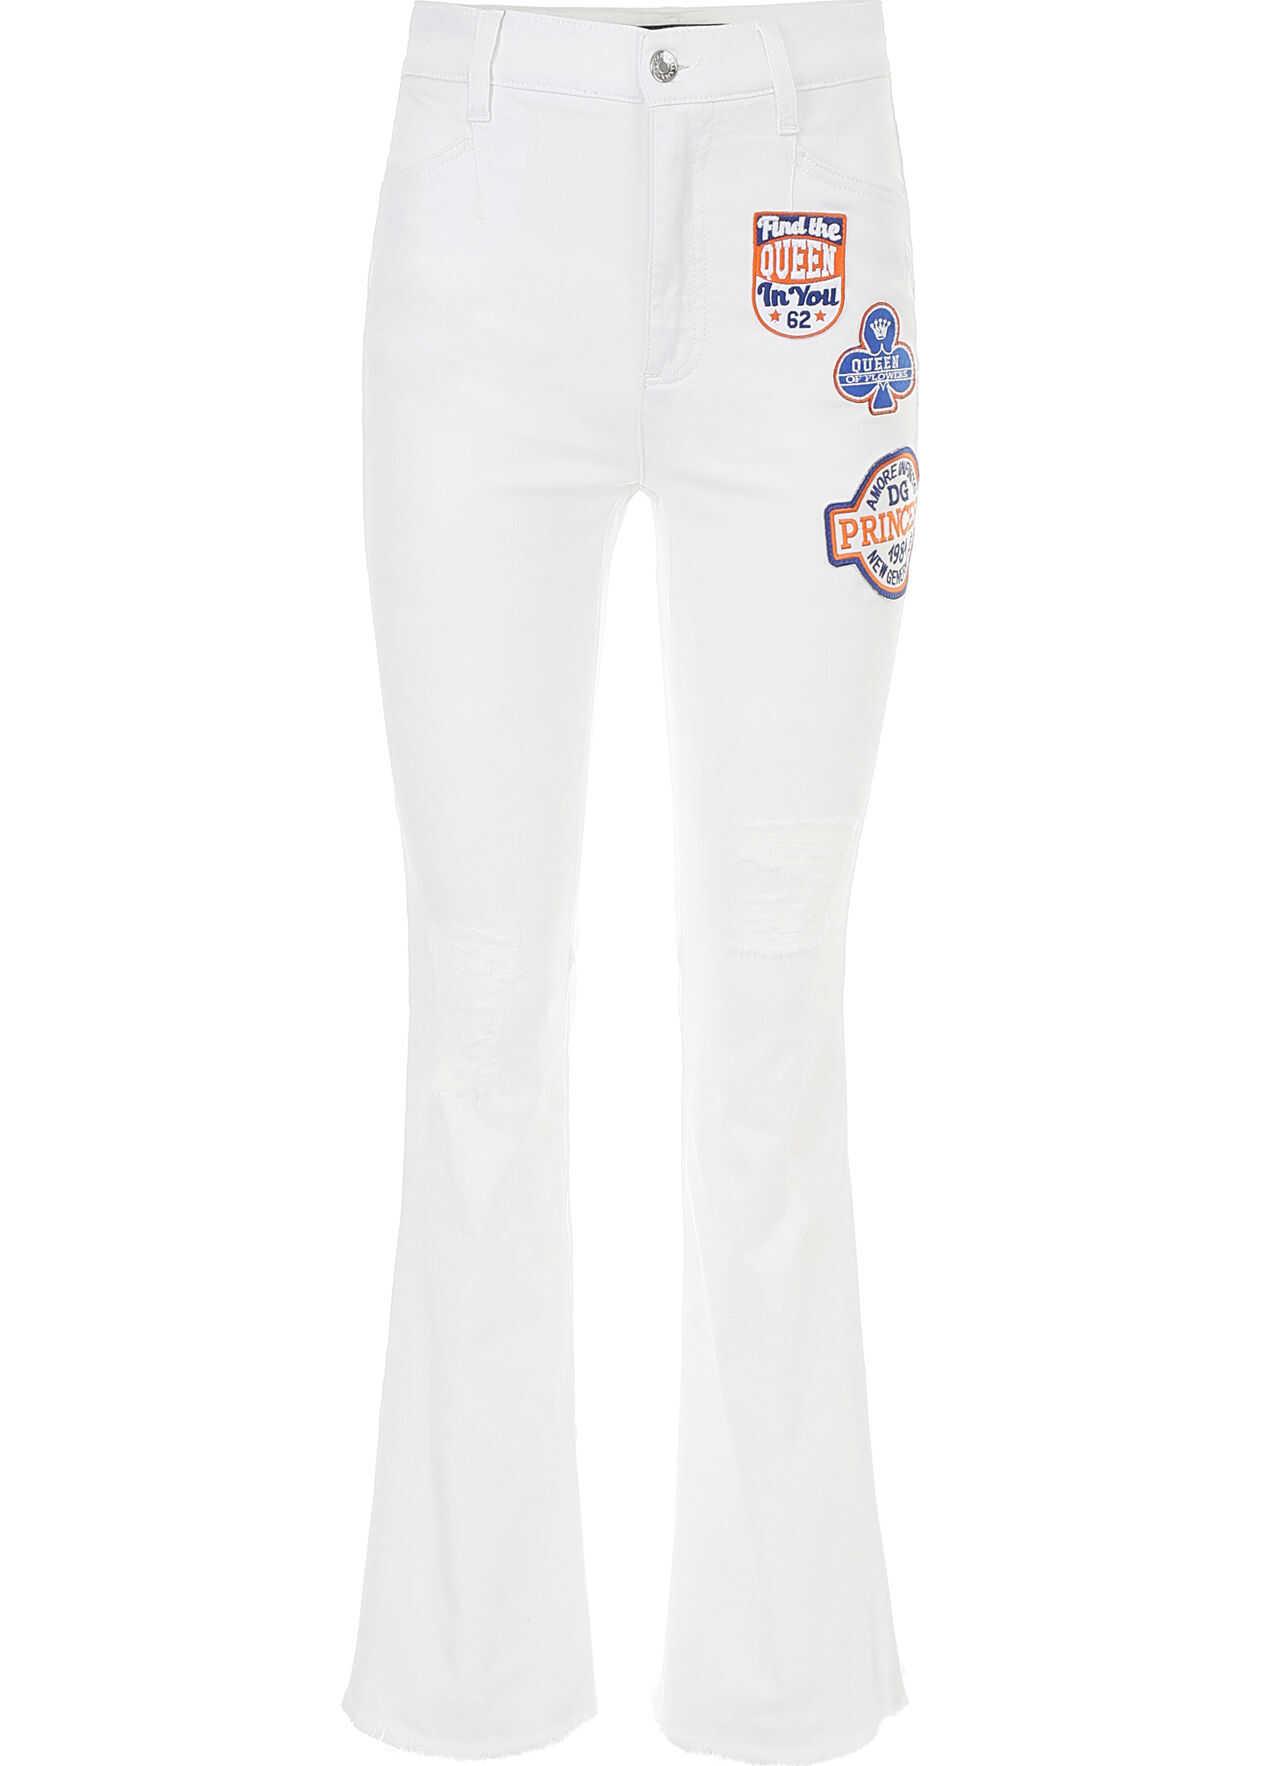 Dolce & Gabbana Flare Jeans With Princess Patch BIANCO OTTICO